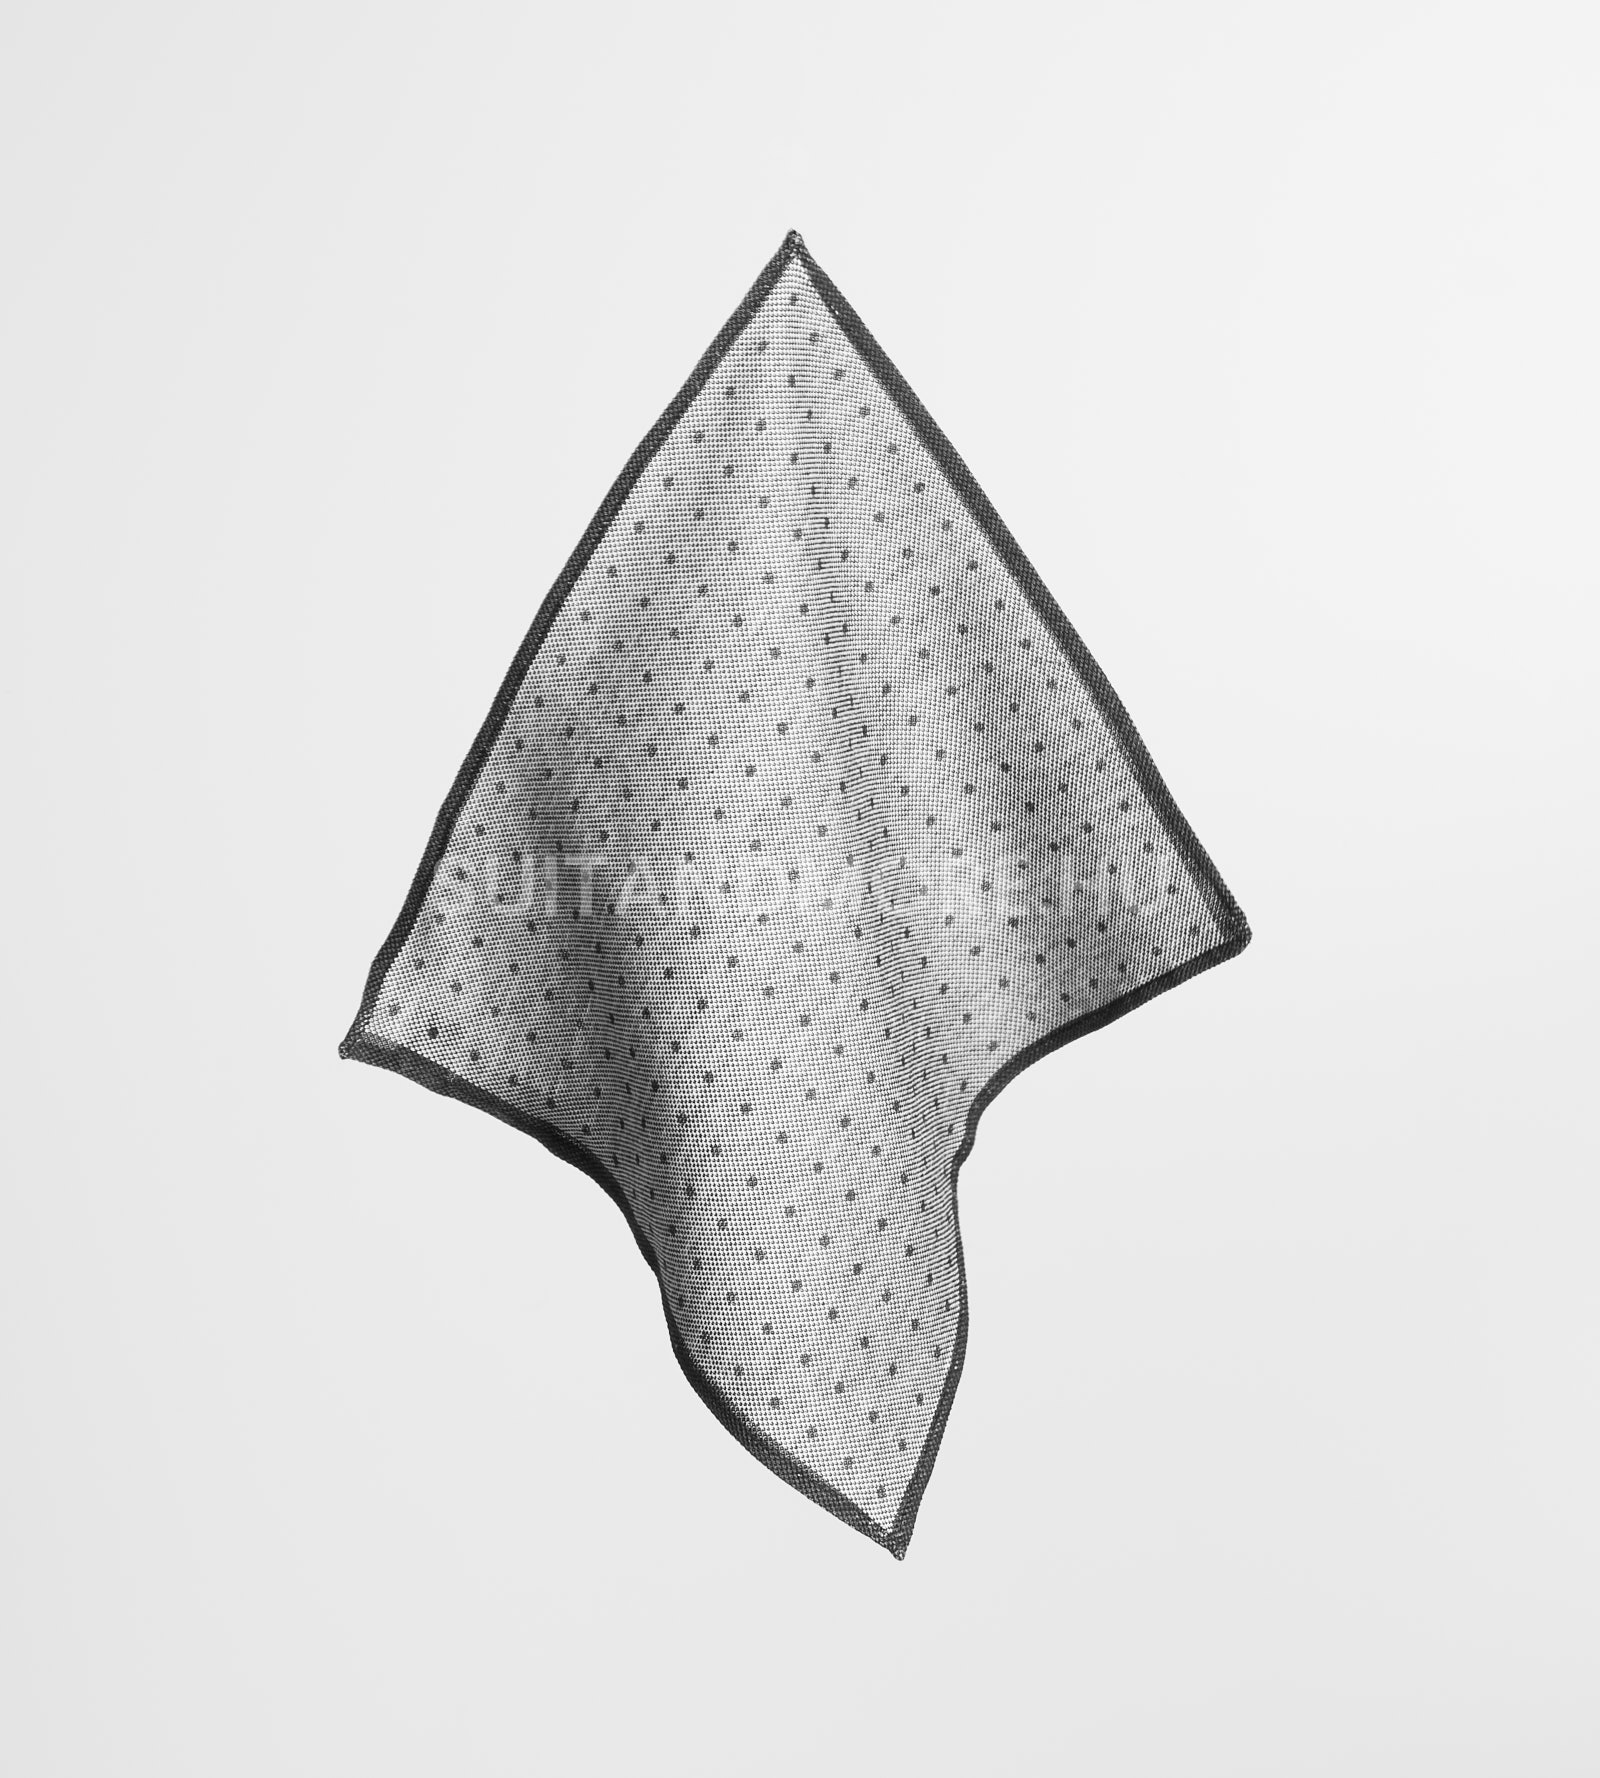 digel-szurke-pottyos-pamut-diszzsebkendo-gabor-1179115-45-01